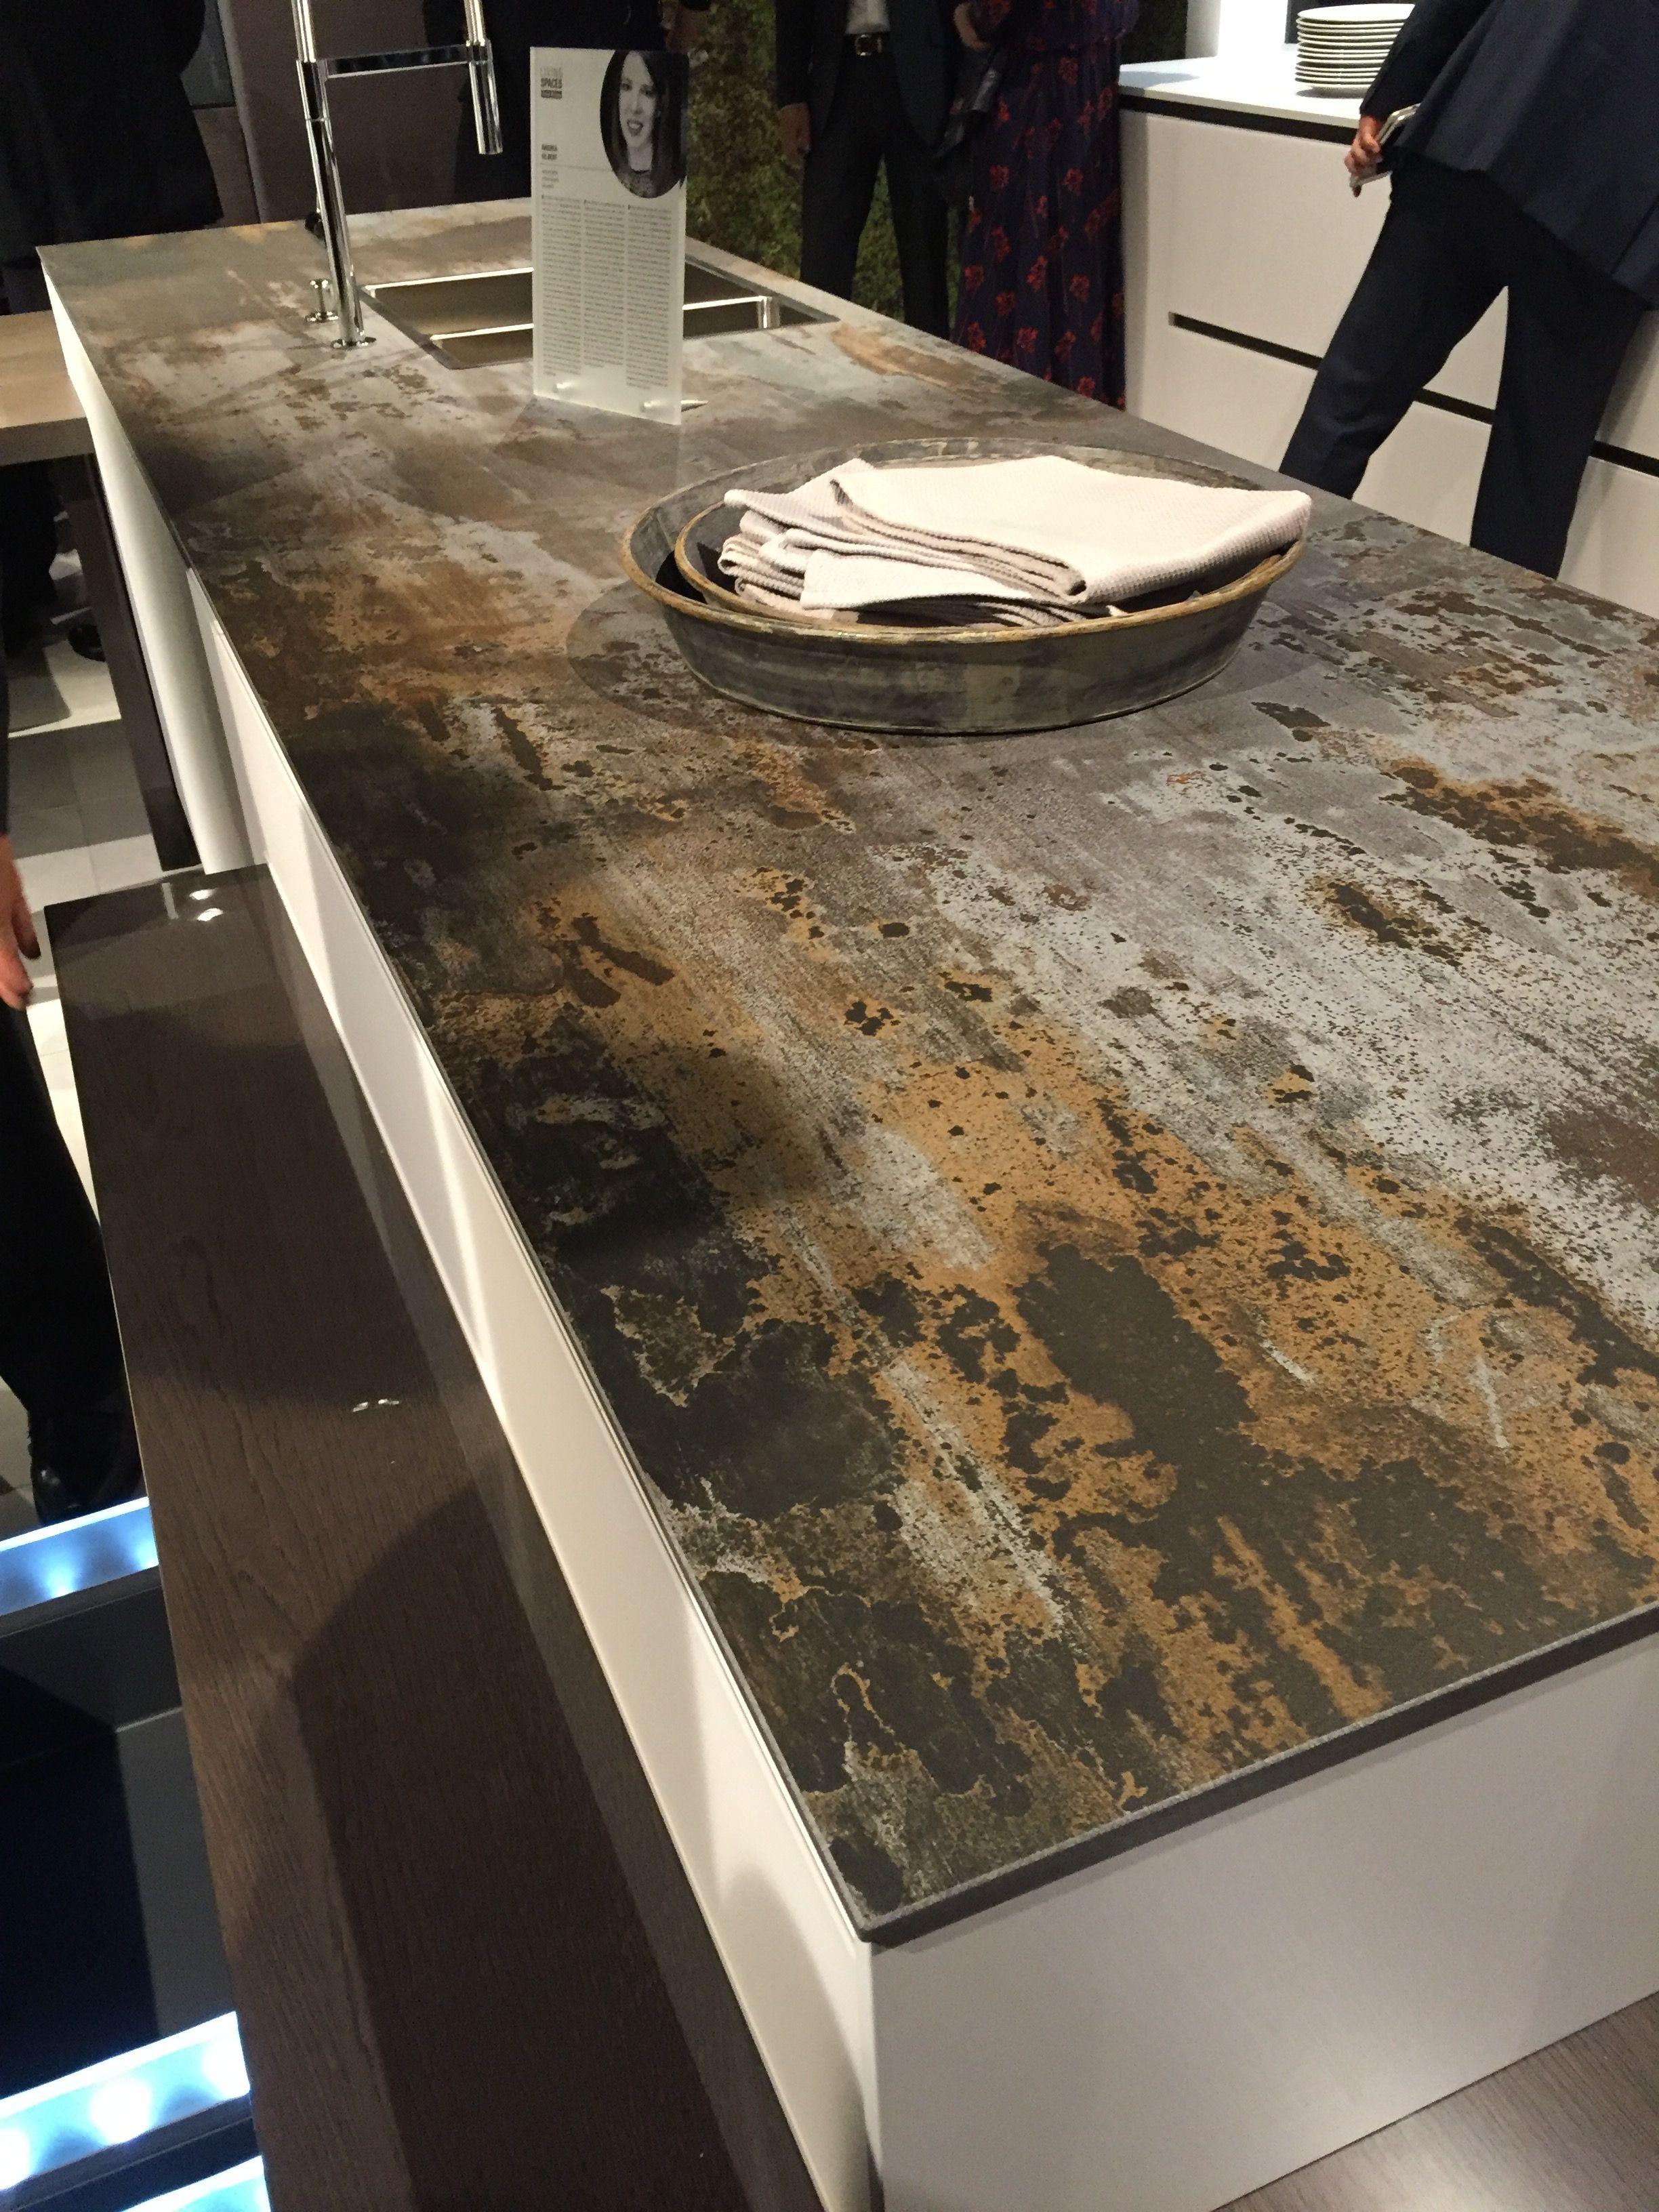 dekton trilium keuken idee n pinterest kitchens countertops and kitchen worktops. Black Bedroom Furniture Sets. Home Design Ideas